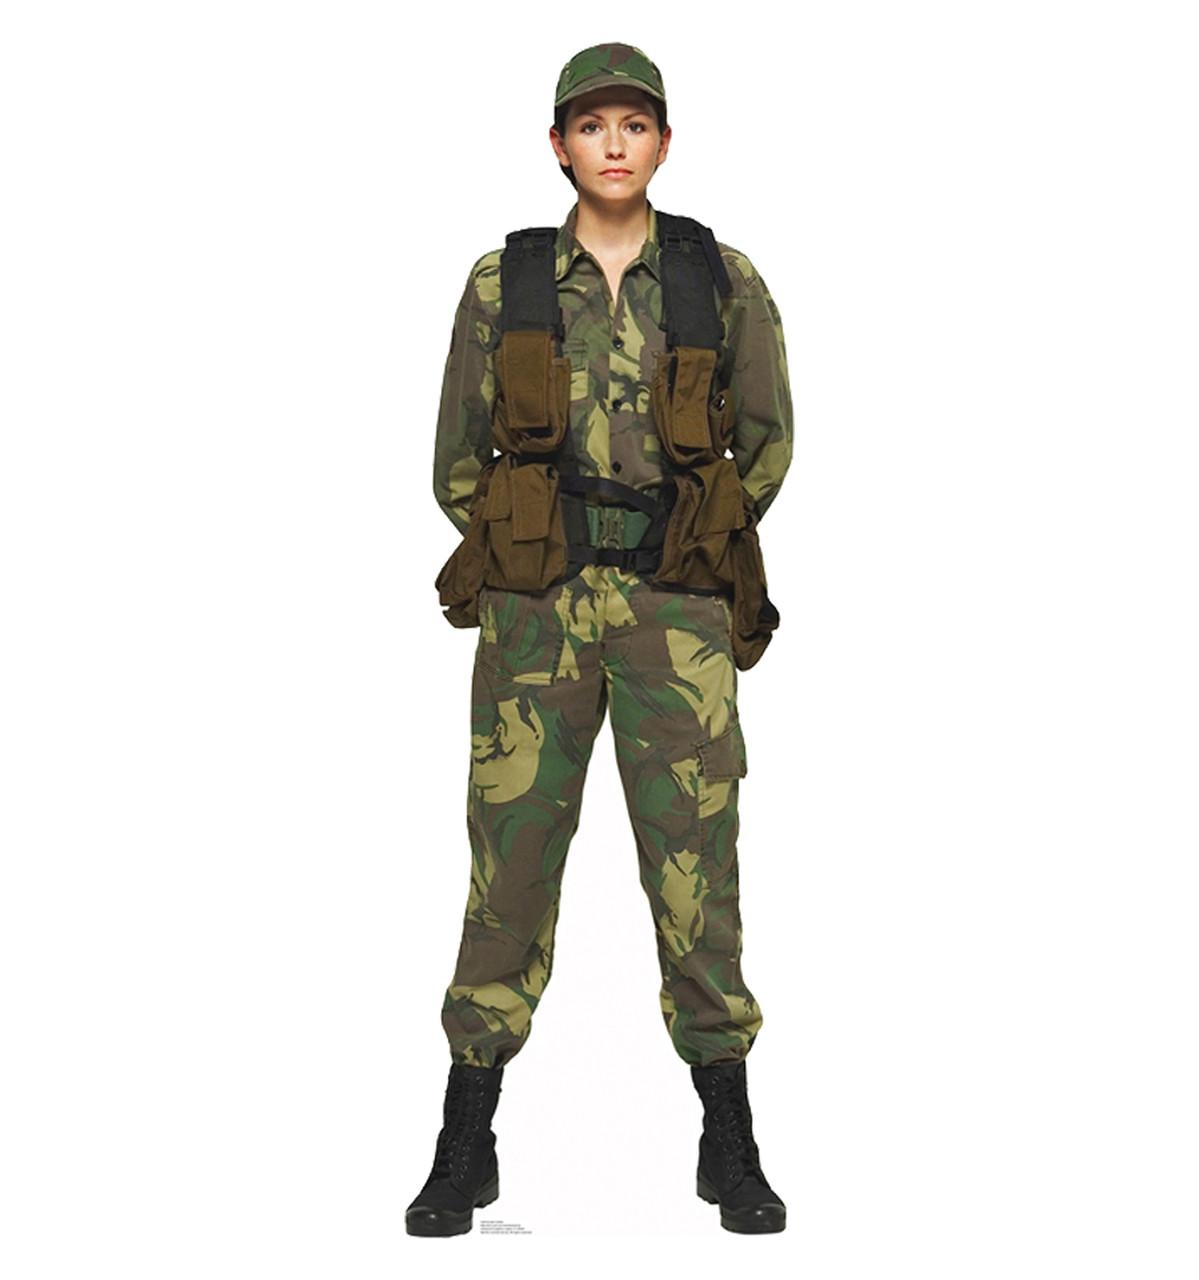 Life Size Female Soldier Cardboard Standup Cardboard Cutout